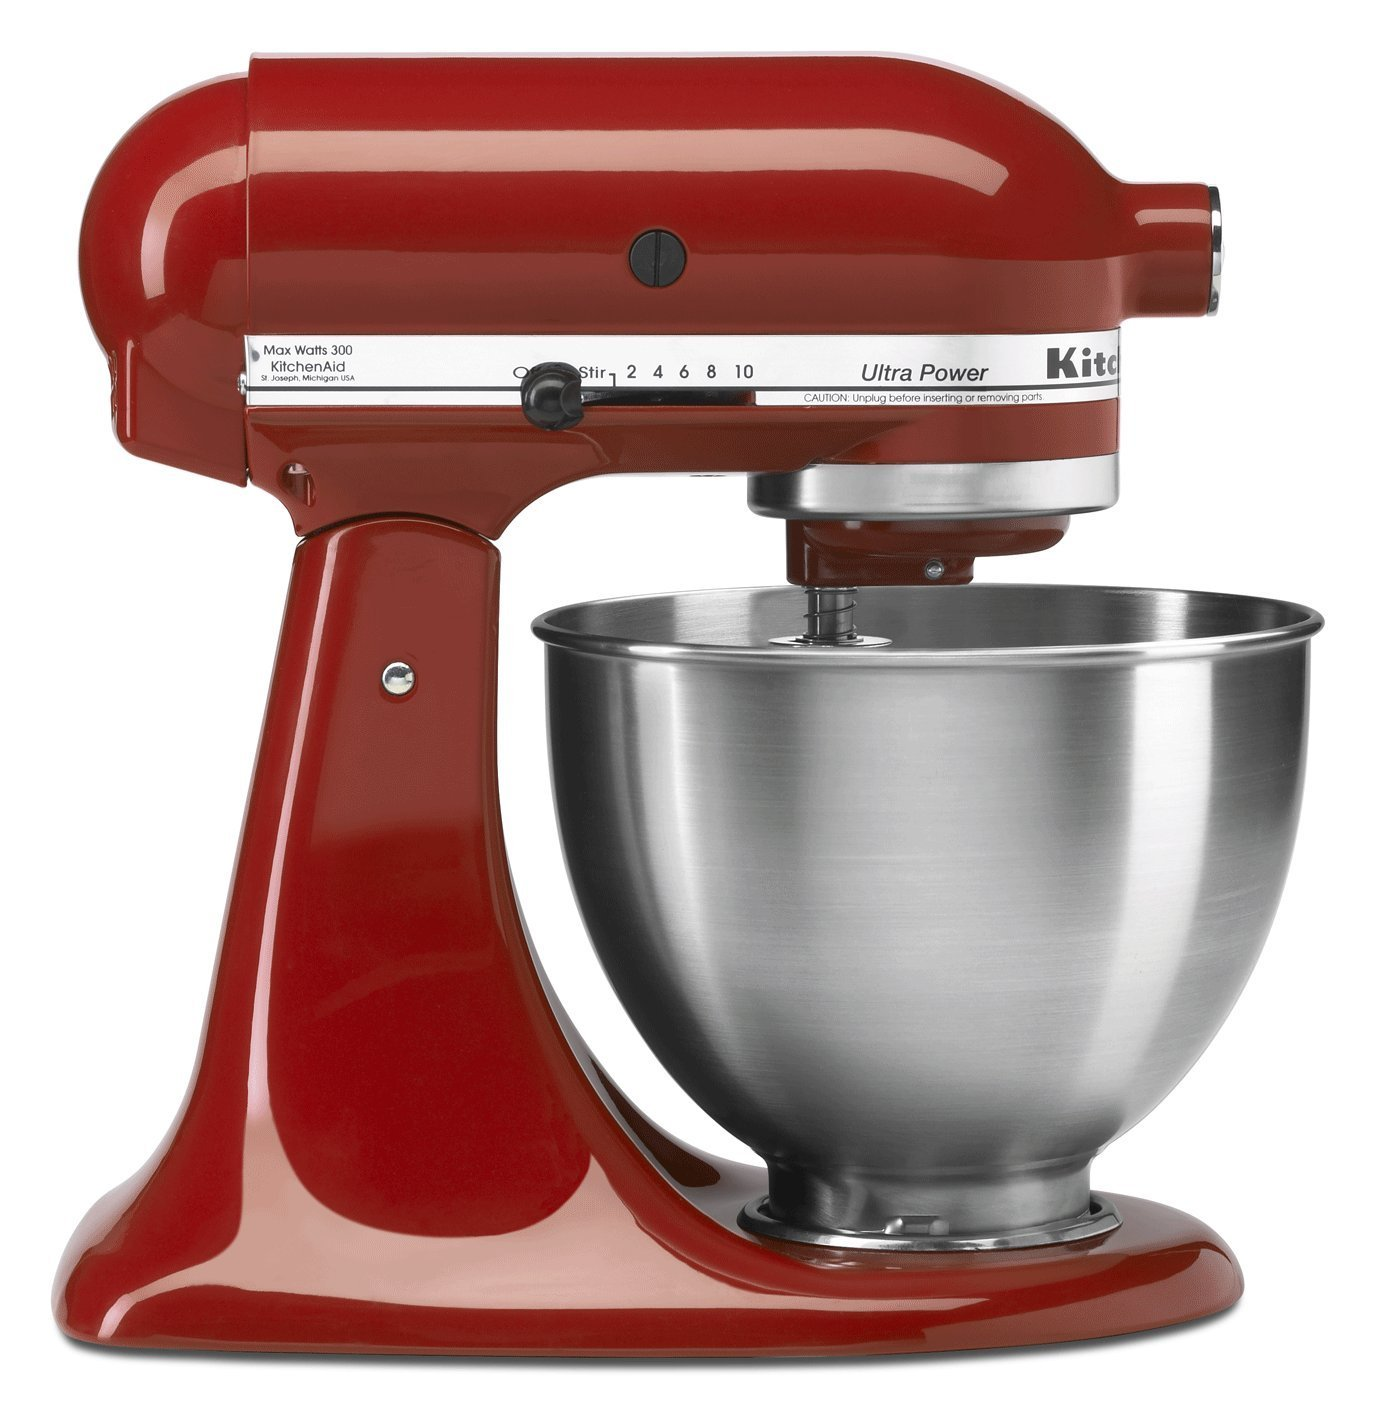 kitchenaid stand mixer ultra power kitchen ideas